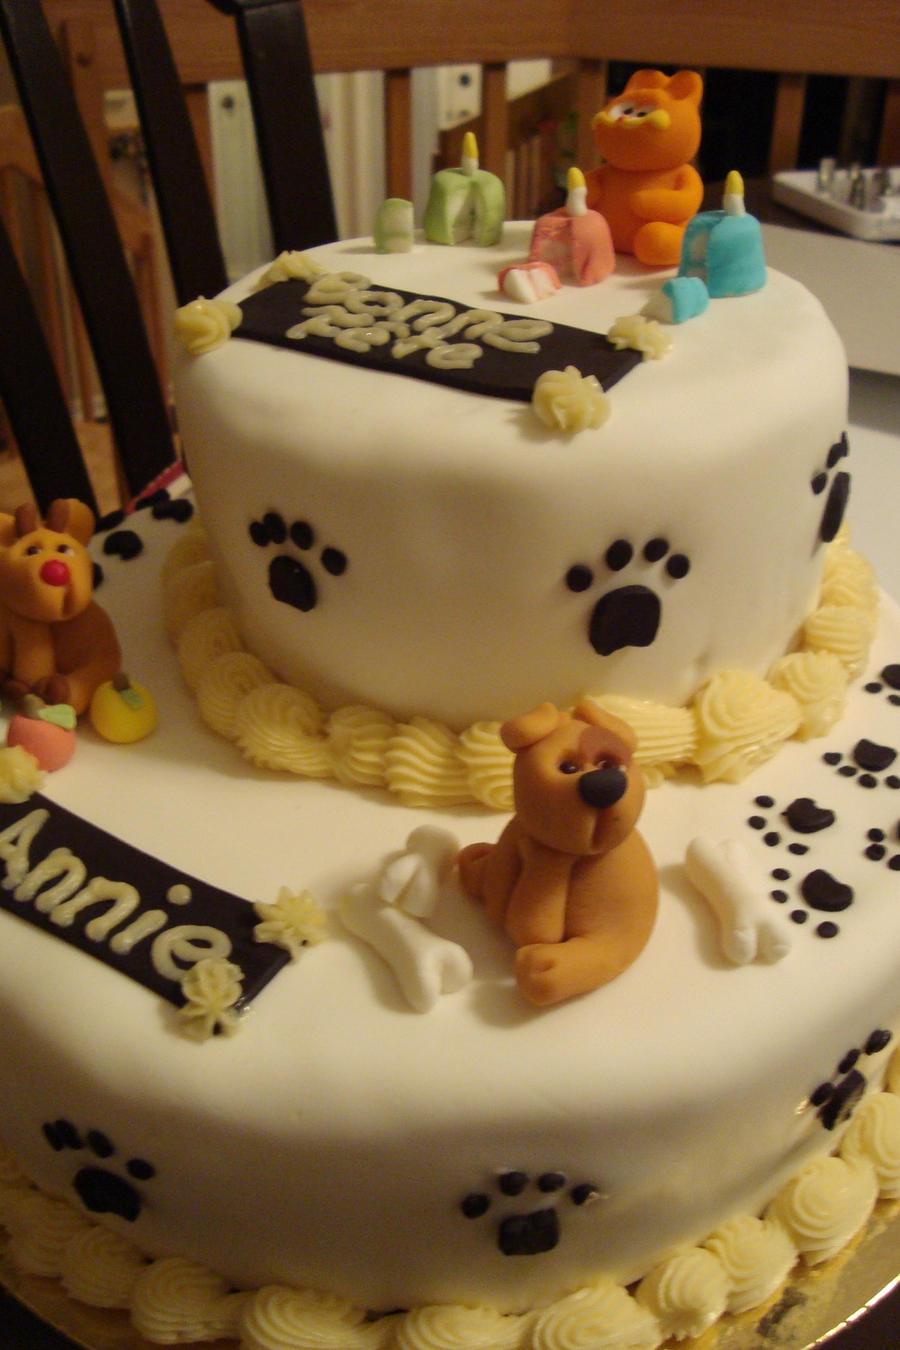 Birthday cake with animals 2 by manga-fire-24